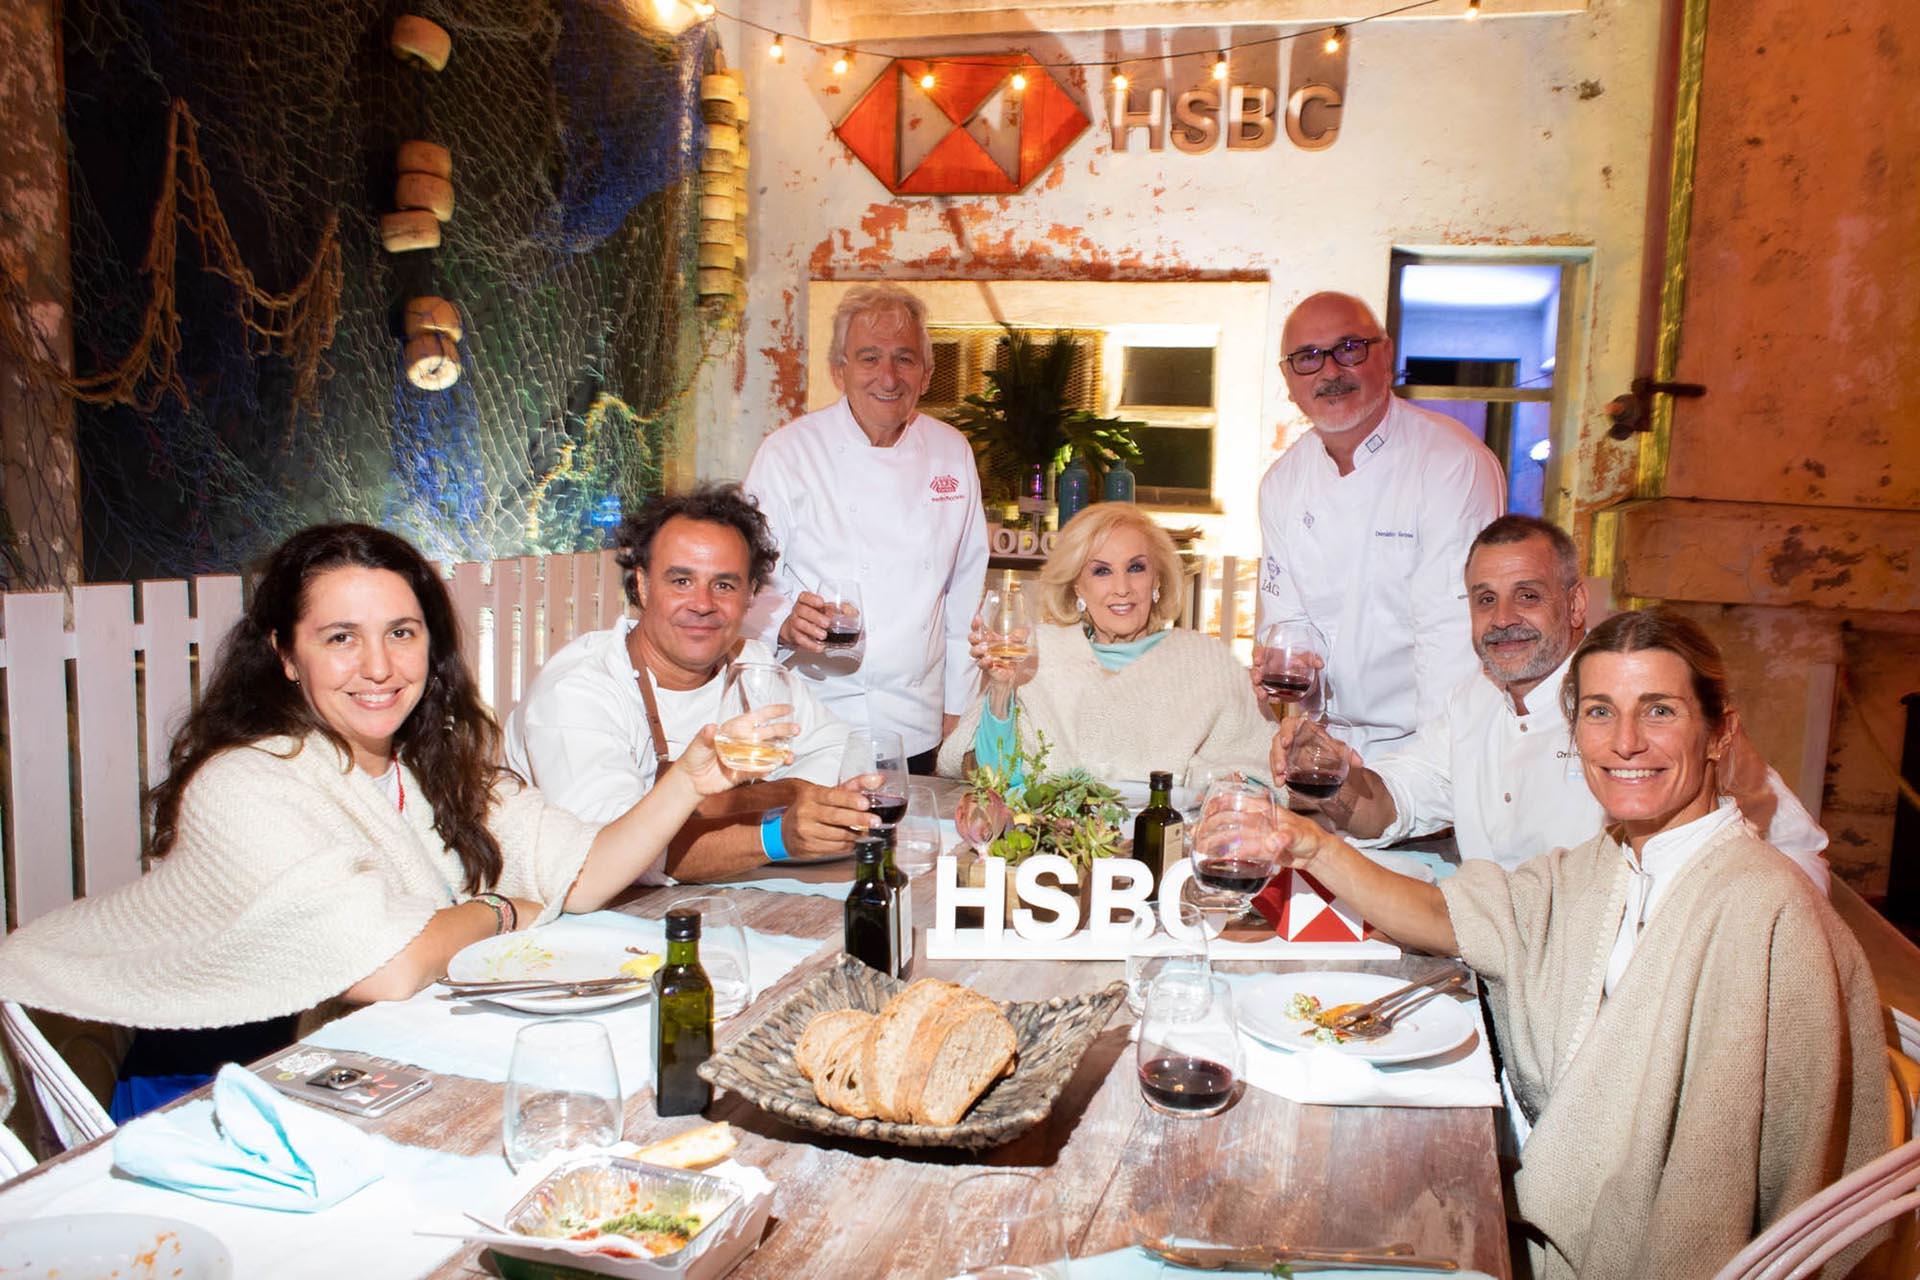 Narda Lepes, Robert Petersen, Pedro Piccau, Osvaldo Gross, Cristian Petersen y Pamela Villar junto a Mirtha Legrand en la mesaza de HSBC en Masticar Mar y Sierra